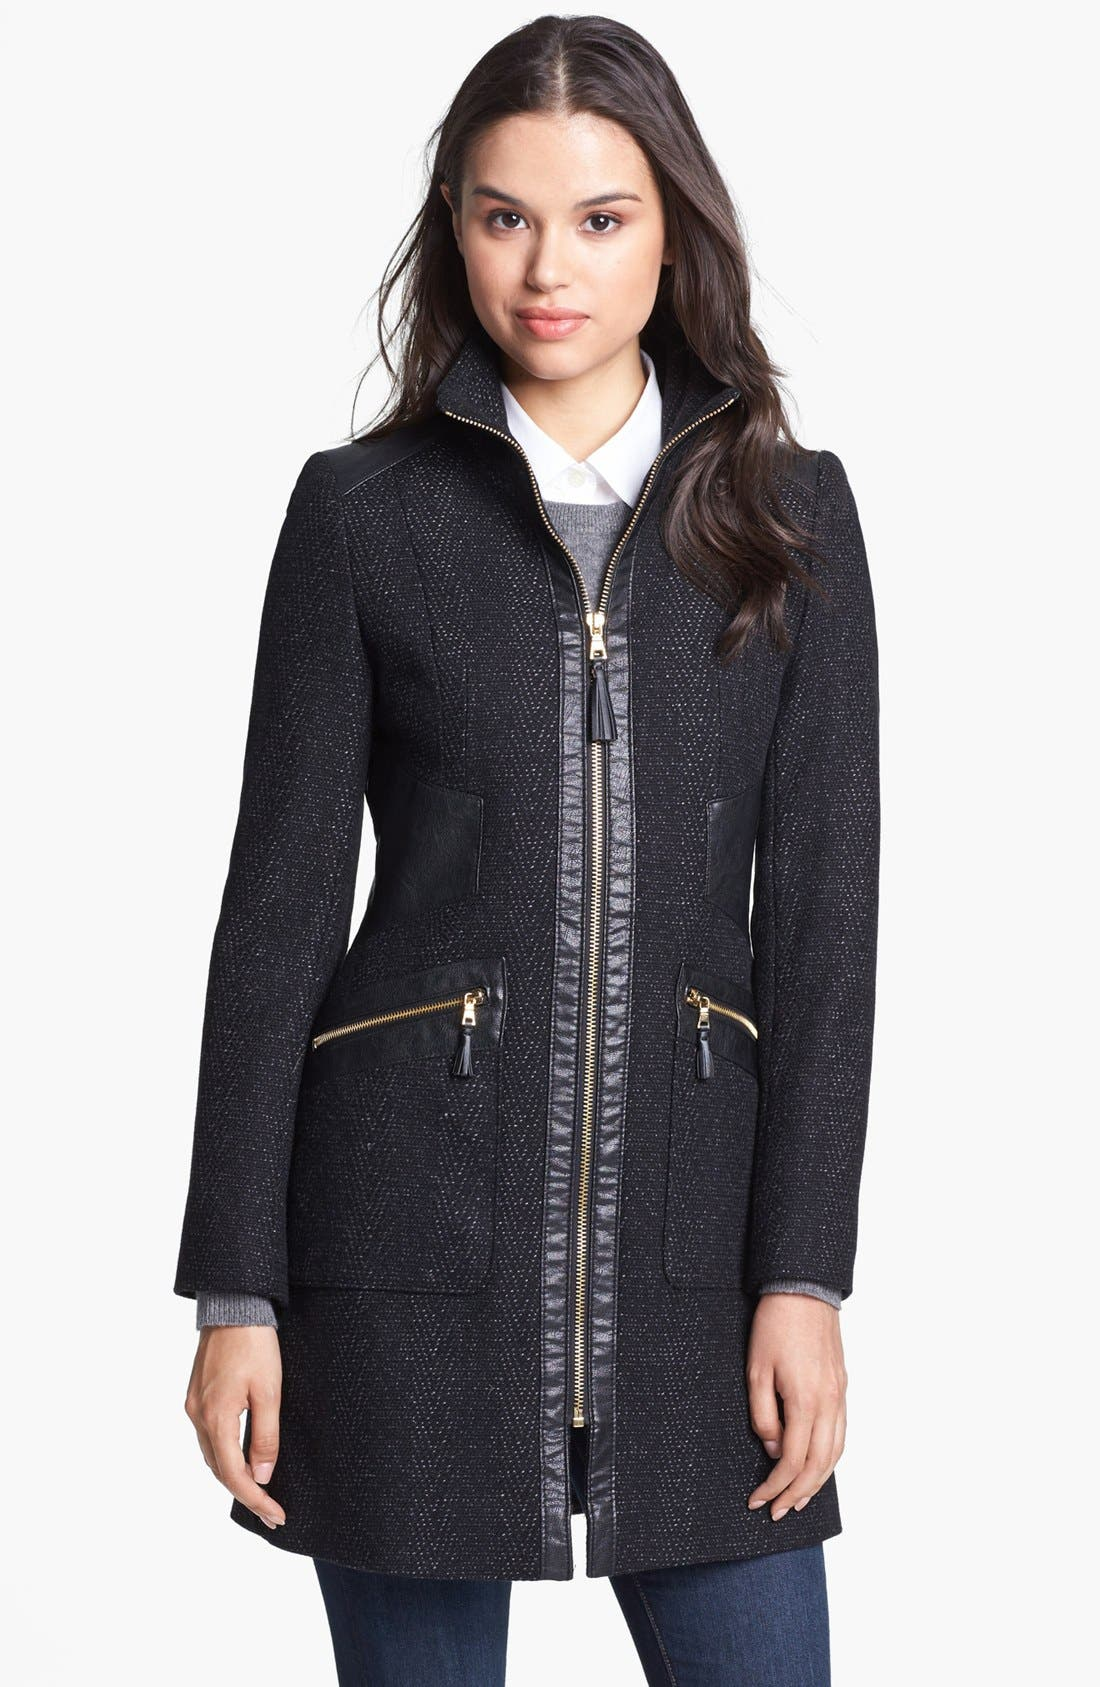 Alternate Image 1 Selected - Via Spiga Faux Leather Trim Tweed Coat (Petite)